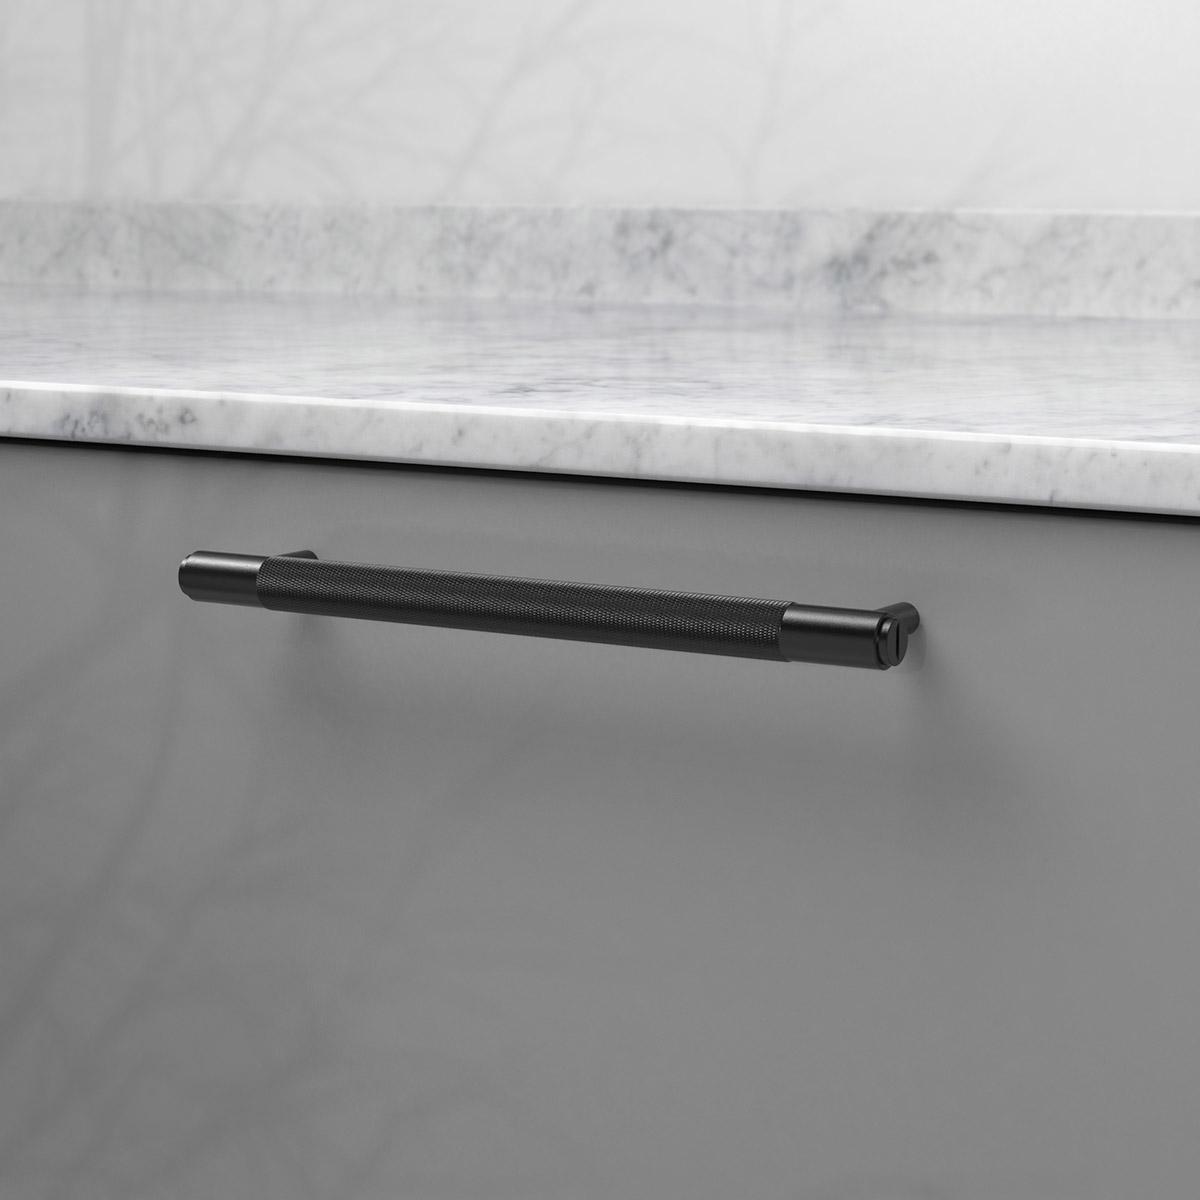 pull bar svart uk pb h 260 bl a cc 225 mm ncs s 4500 n marmor carrara